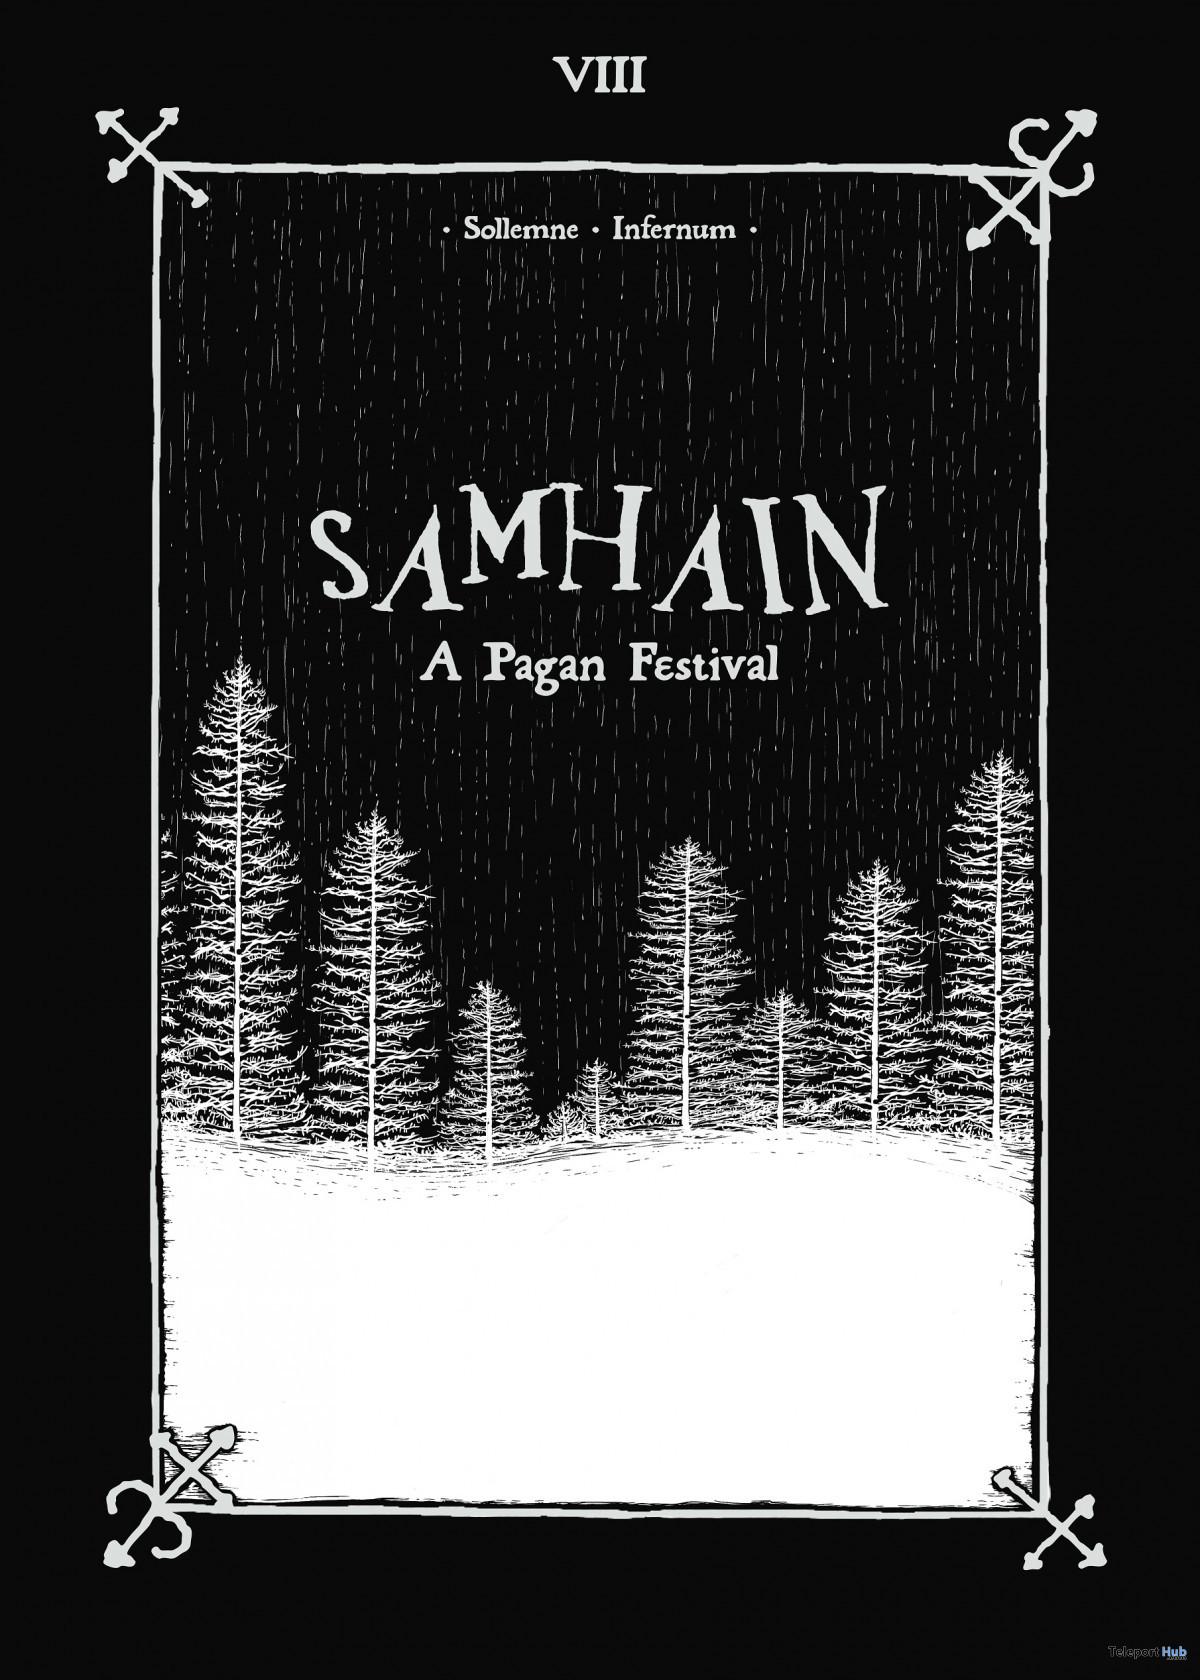 SAMHAIN: A Pagan Festival 2020 - Teleport Hub - teleporthub.com